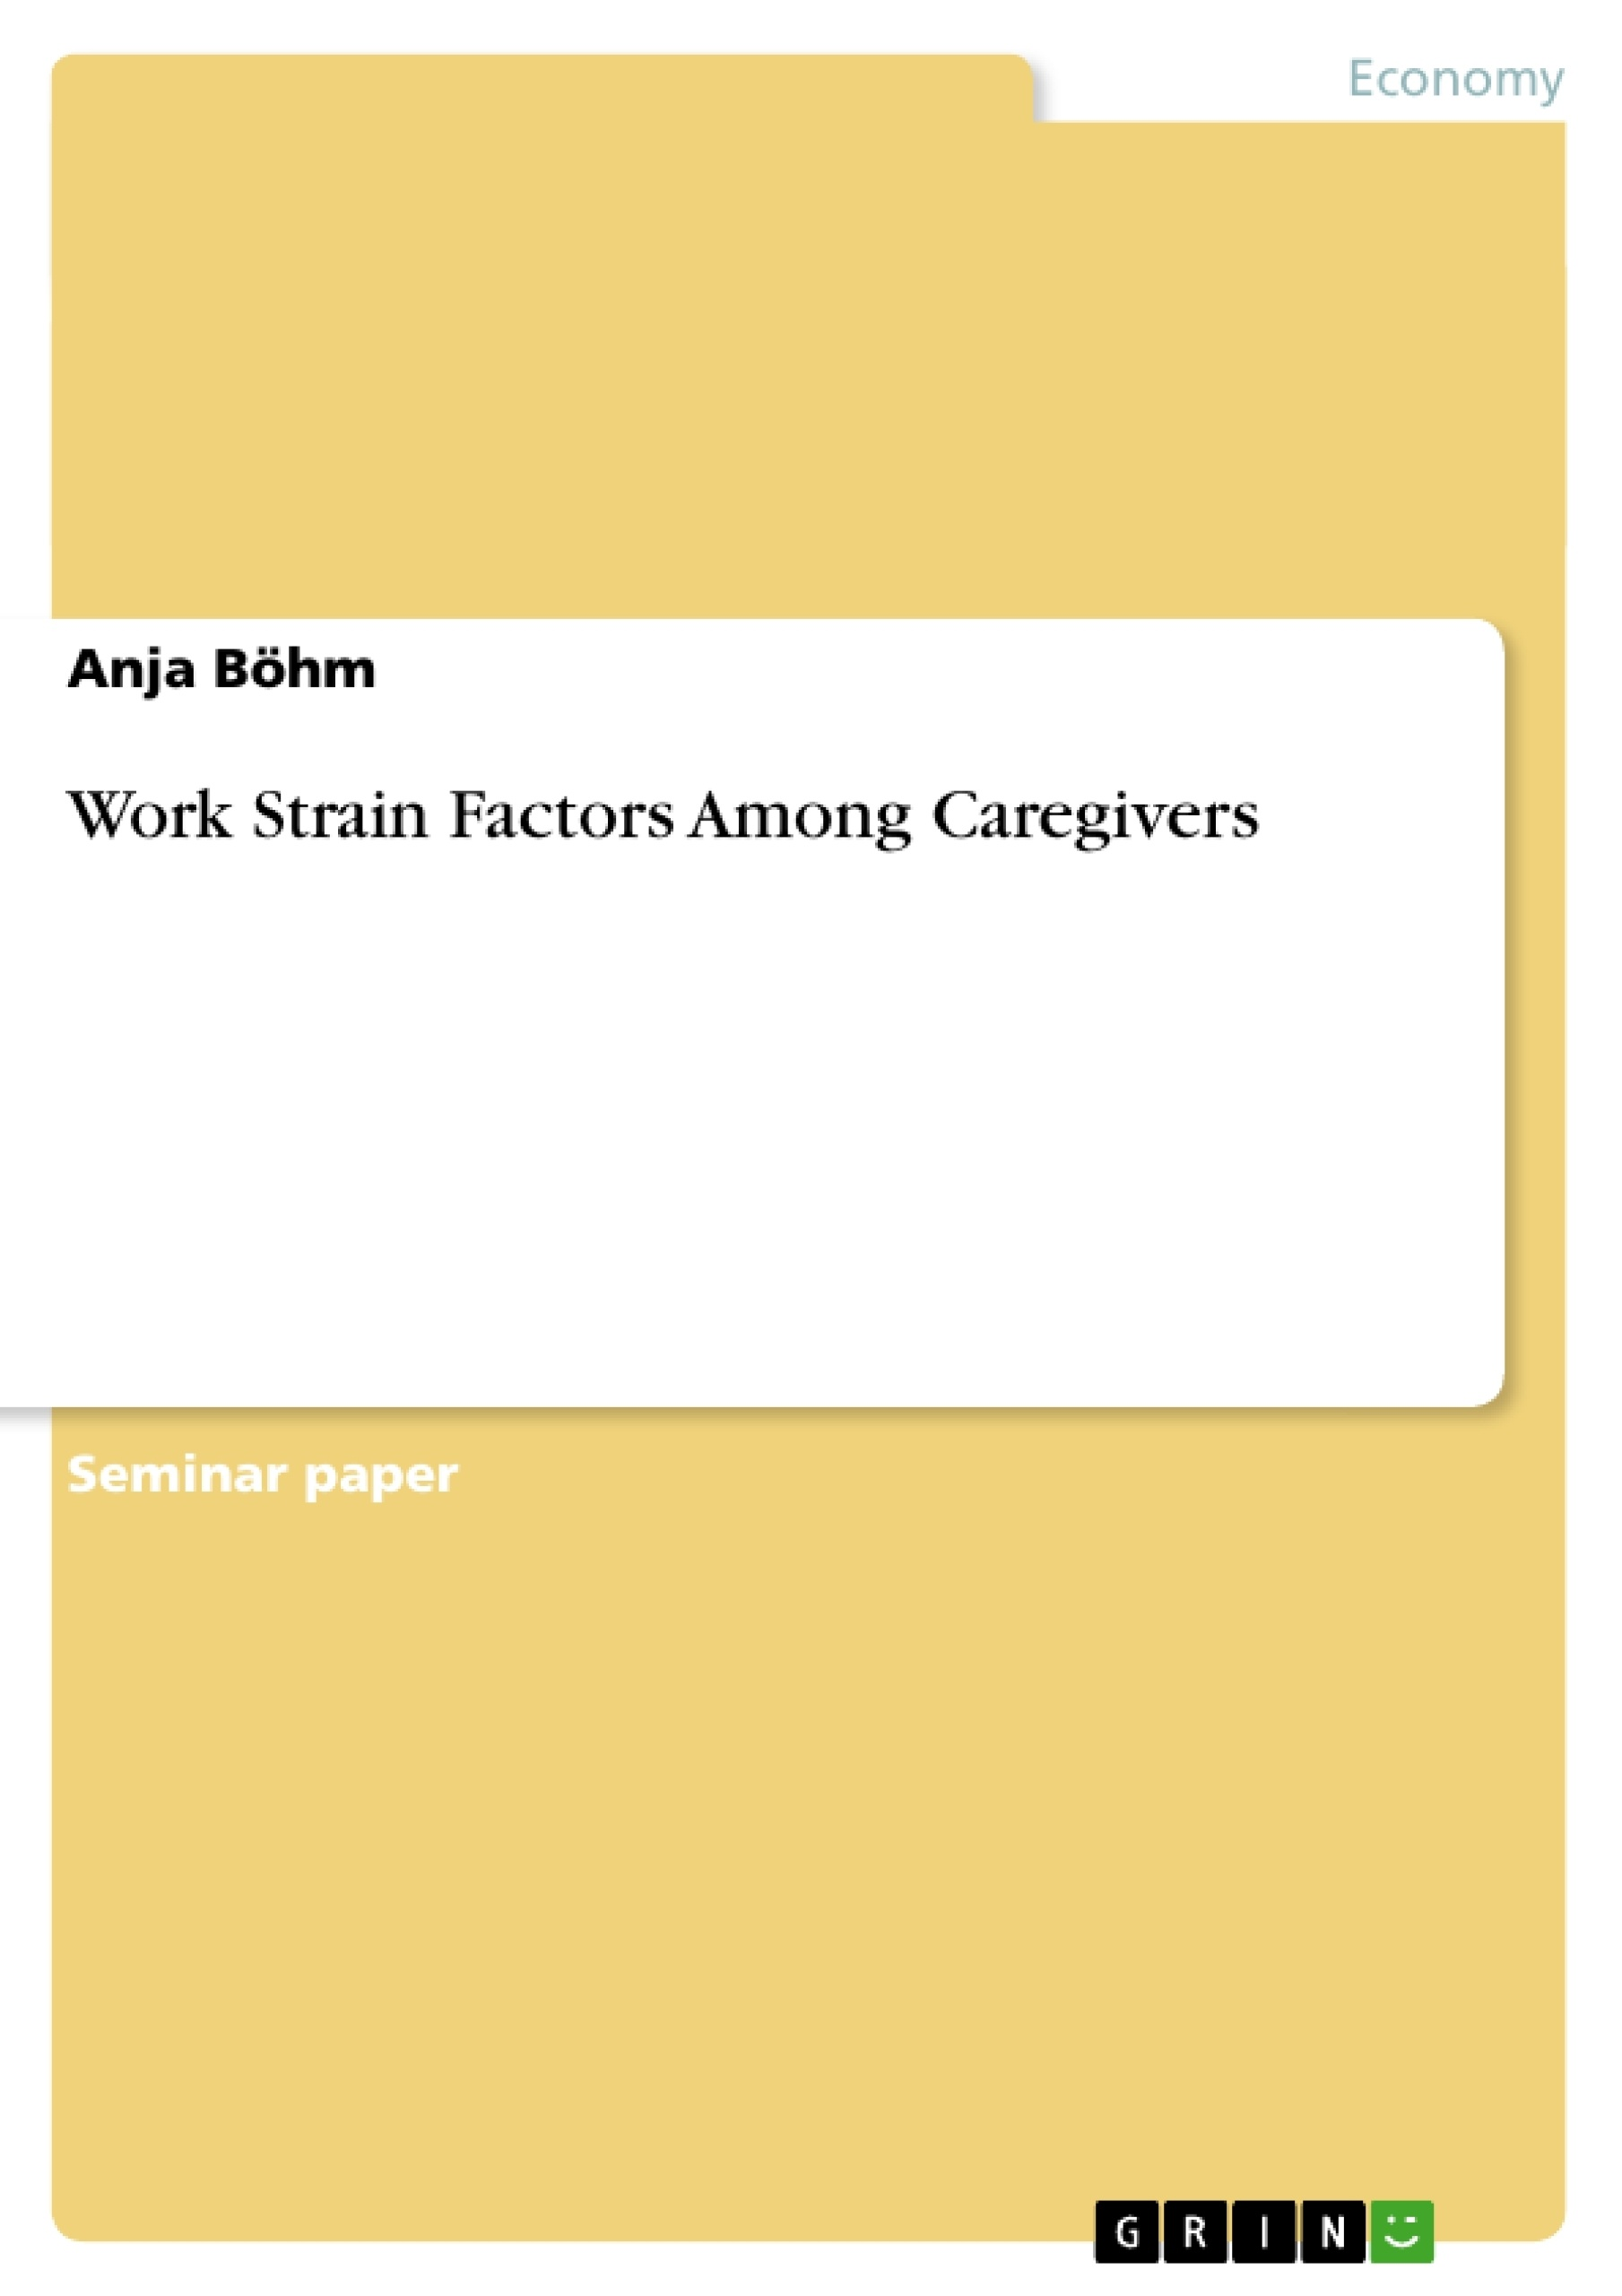 Title: Work Strain Factors Among Caregivers